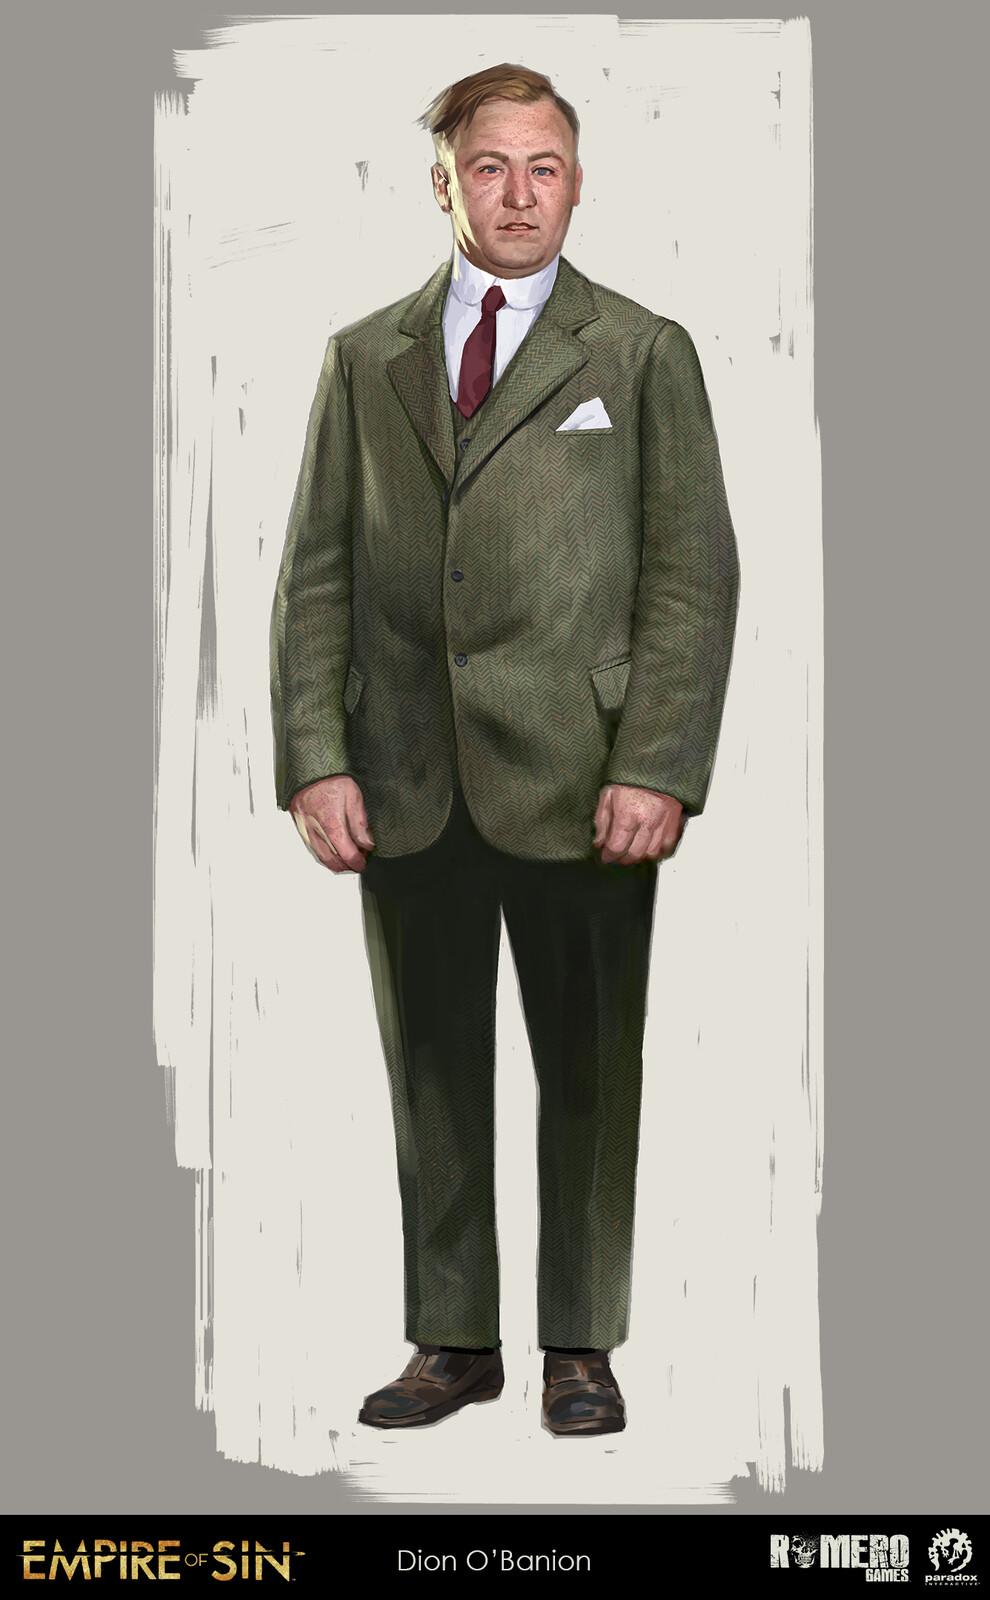 Dion O'Banion concept art. Irish-American boss of The Northside Mob.